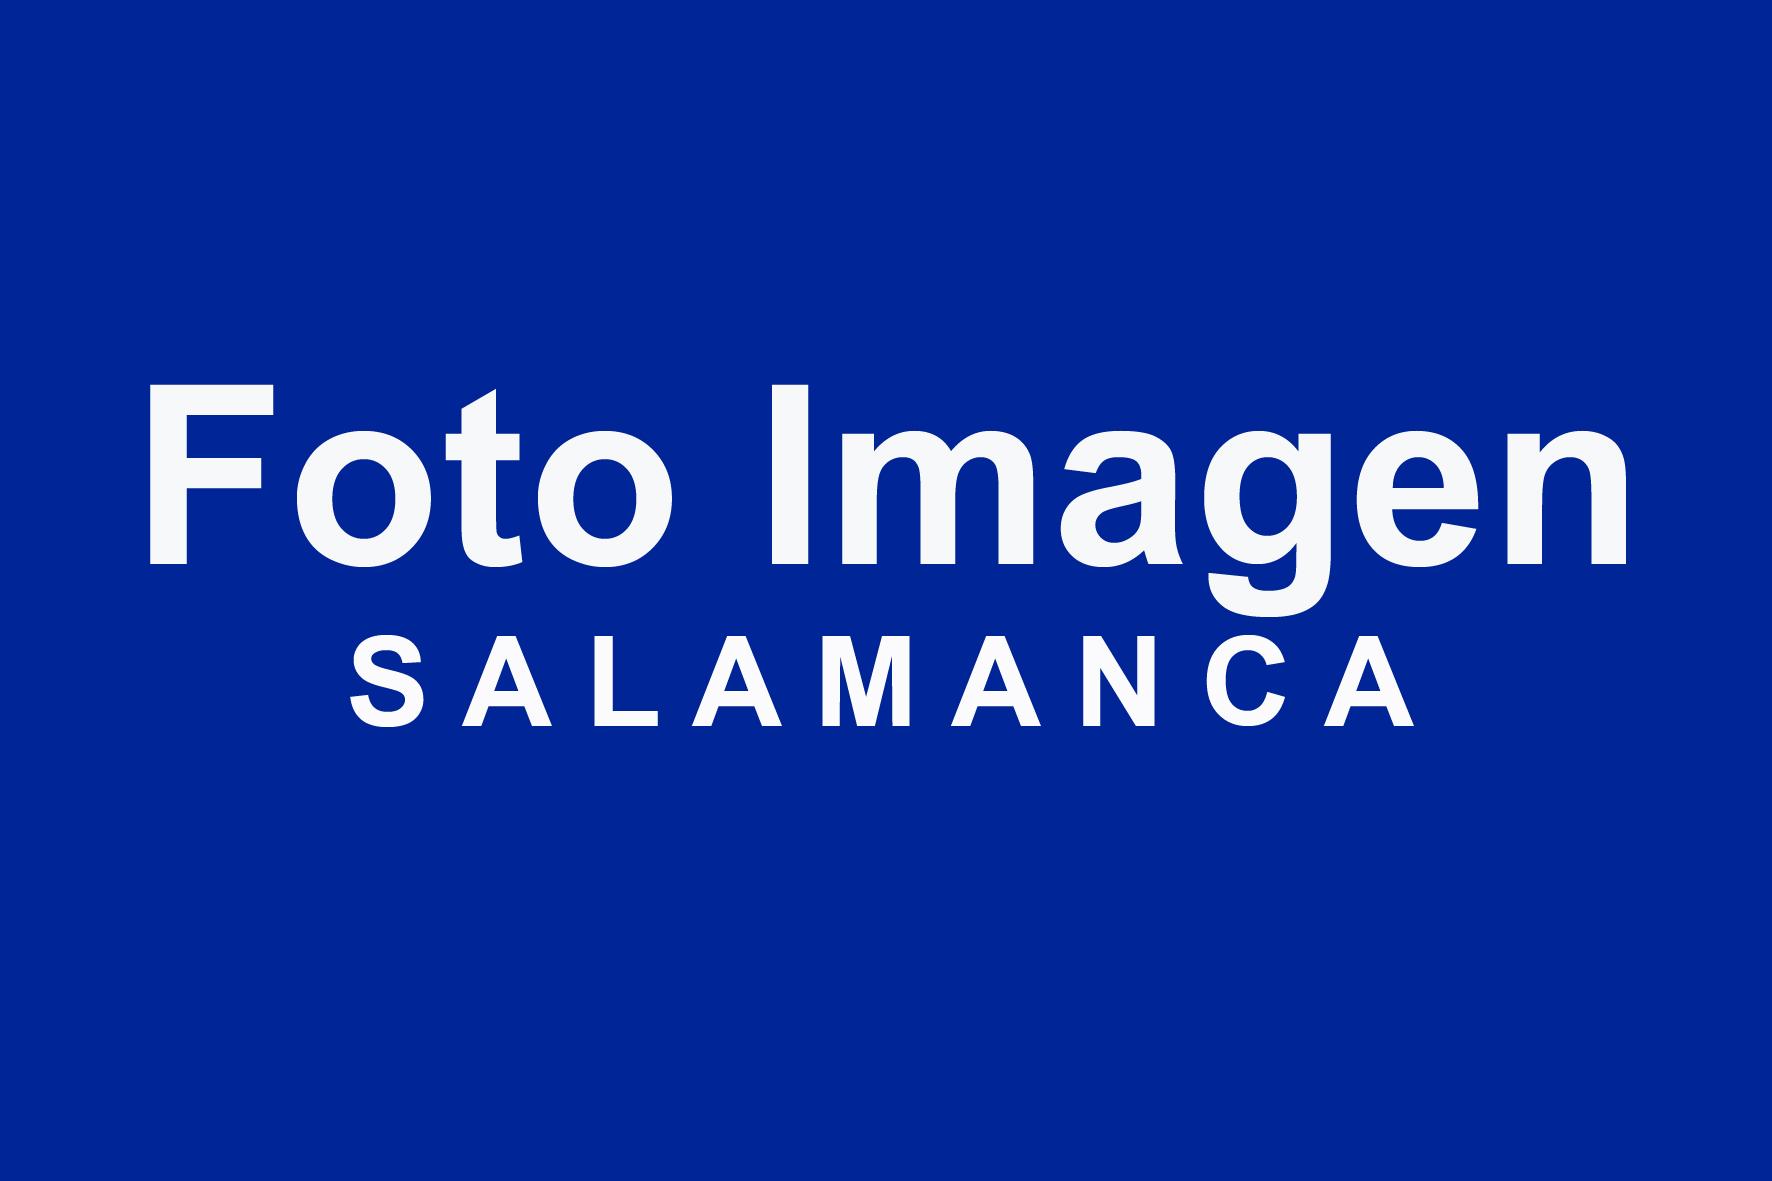 Logo comerç Fotoimagen Salamanca